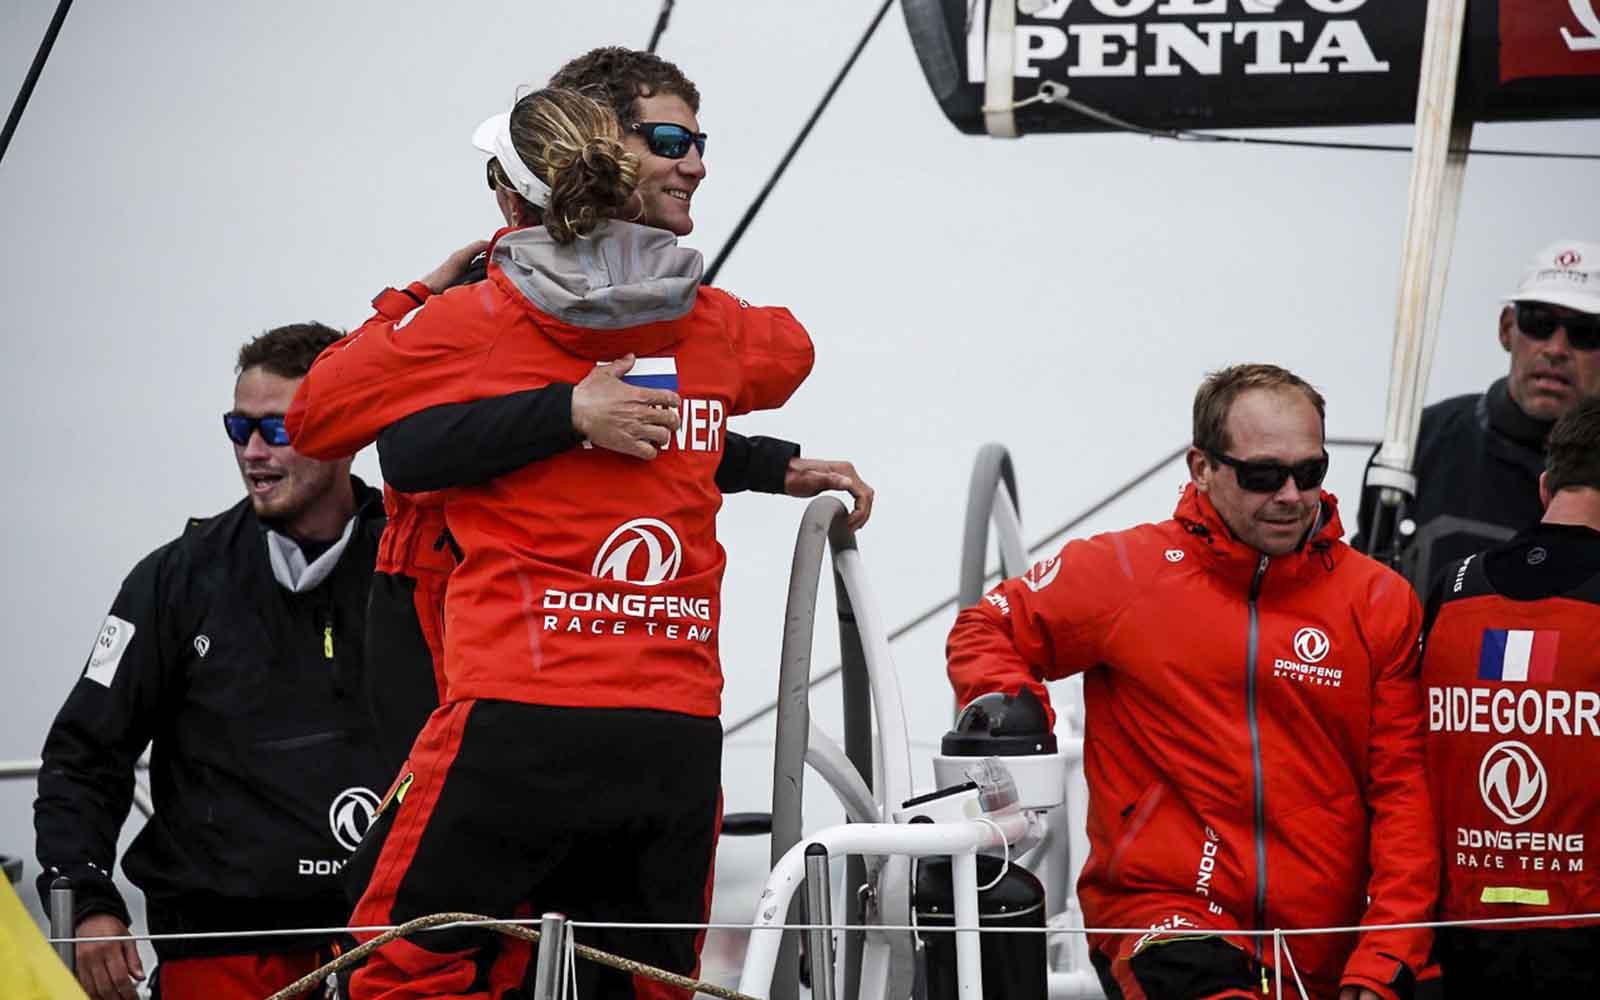 Donfeng vence Volvo Ocean Race - boat shopping 2